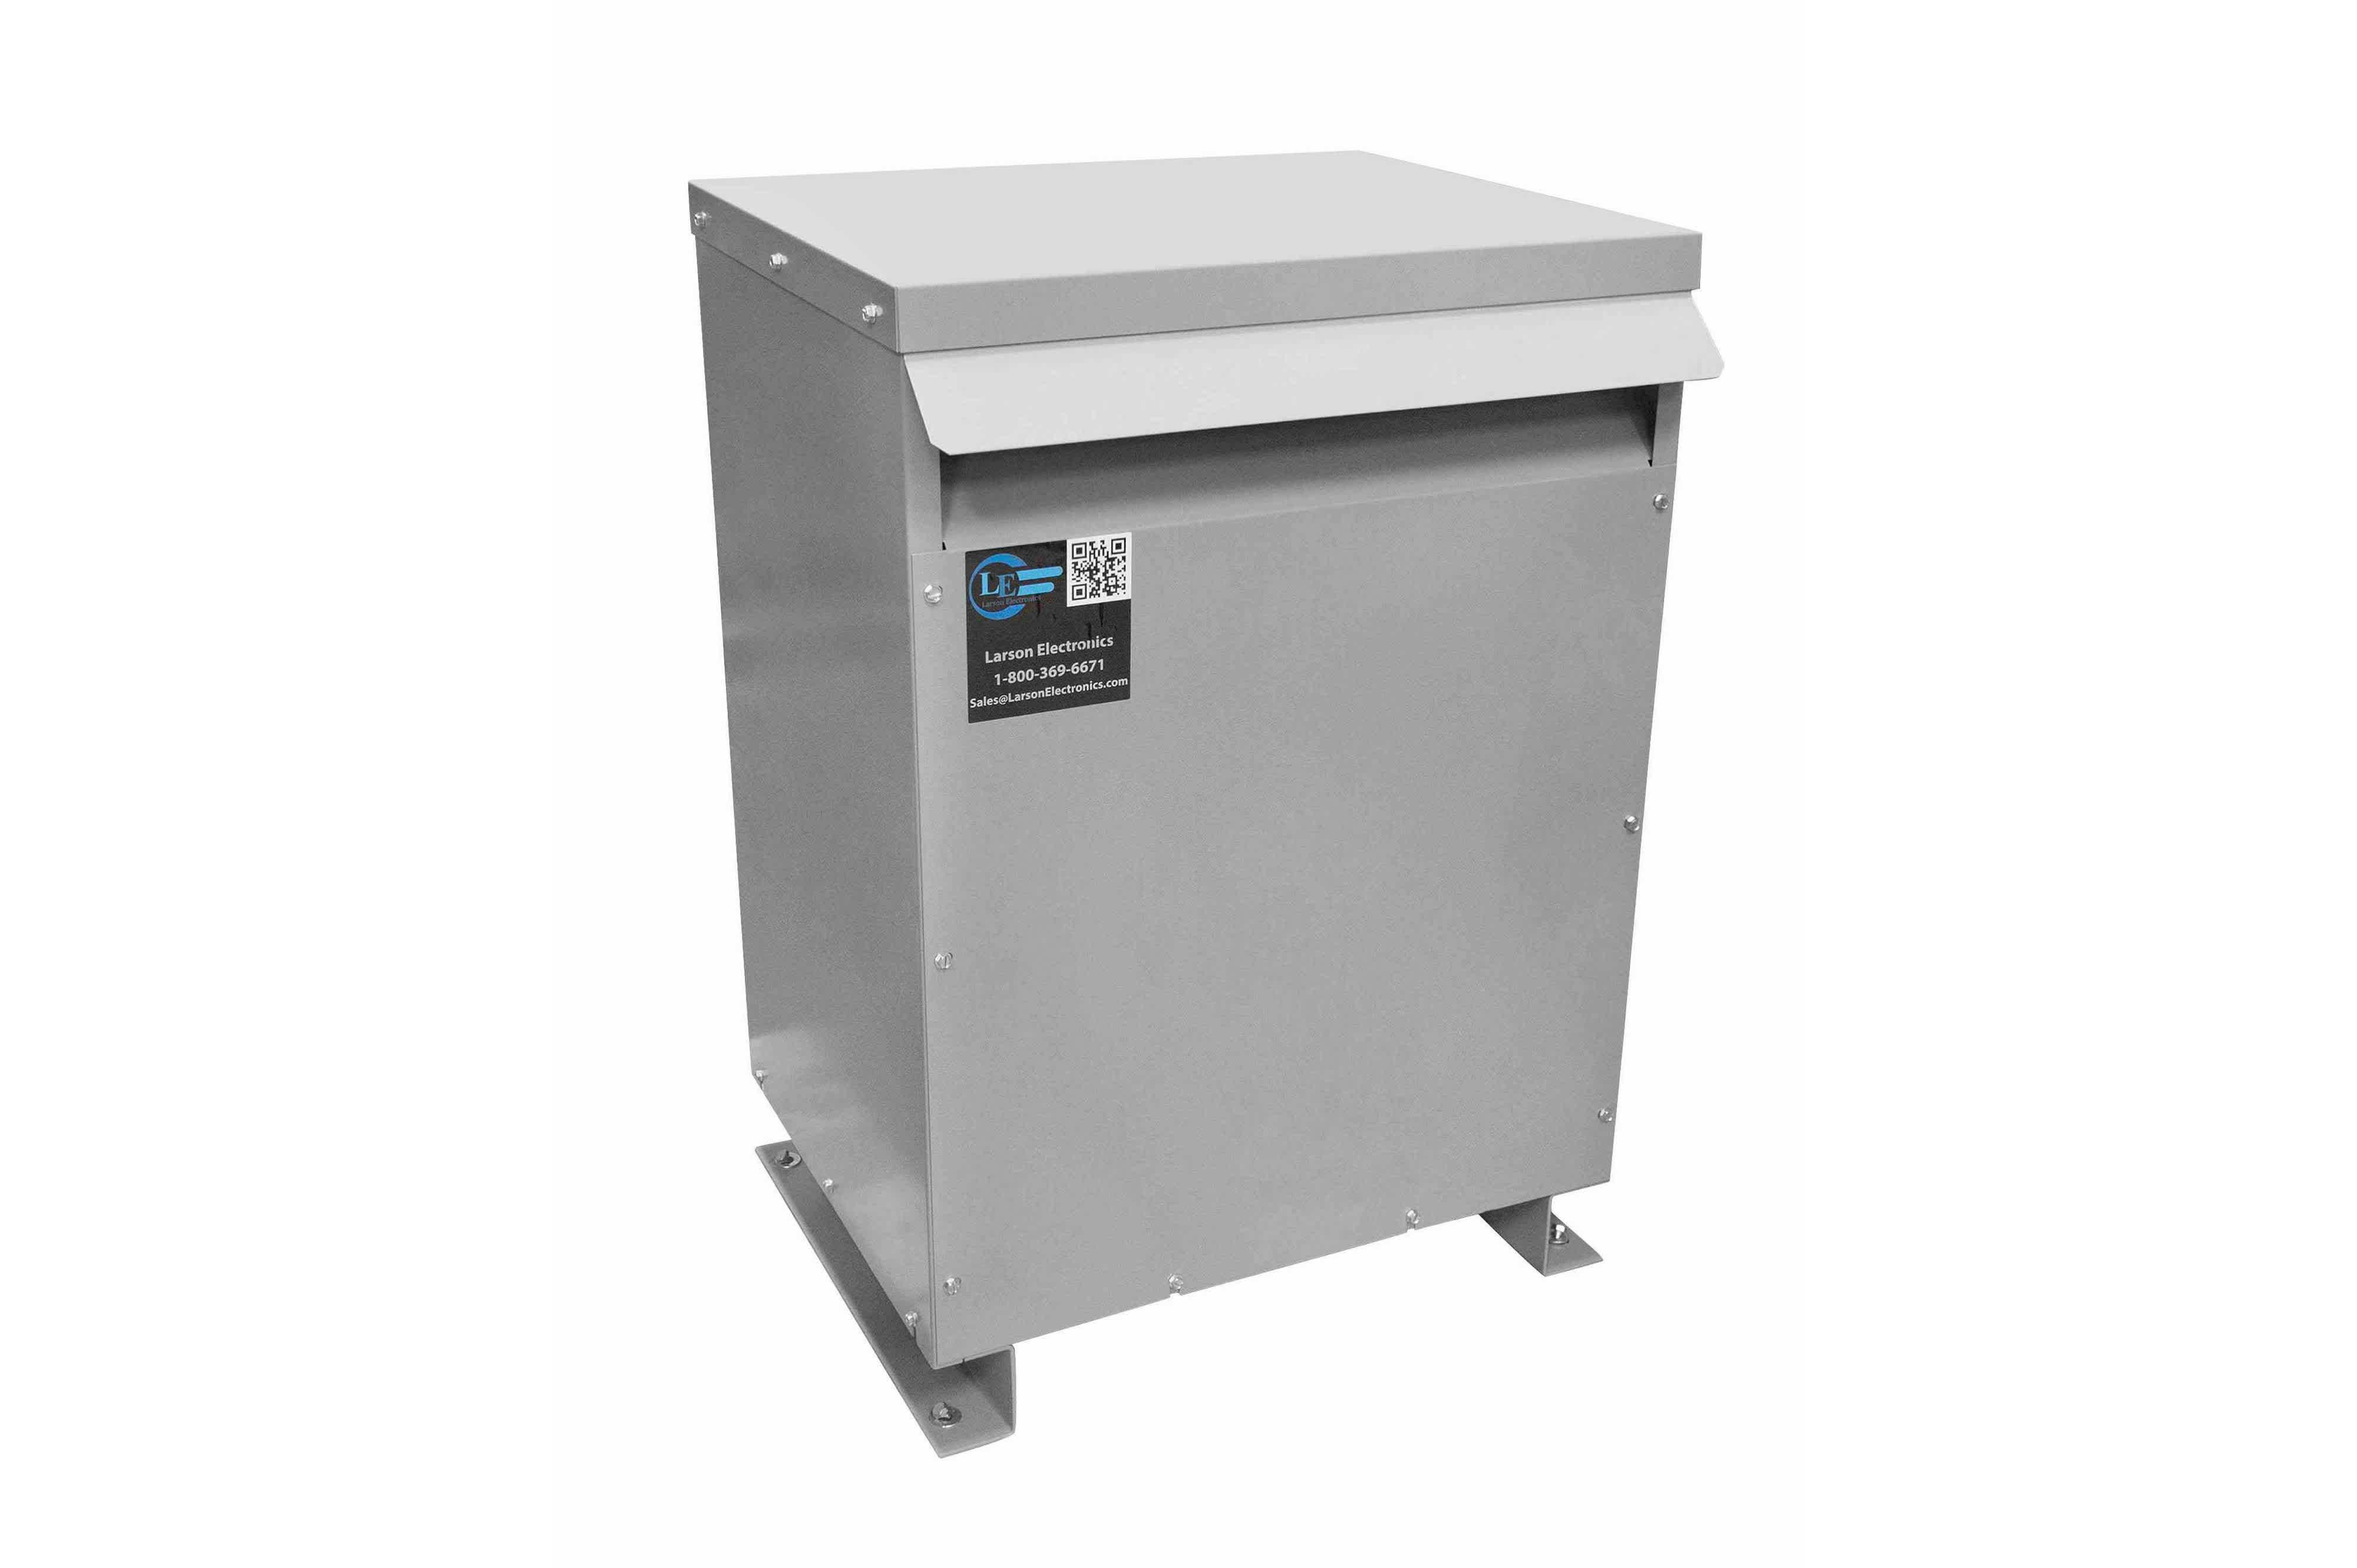 40 kVA 3PH Isolation Transformer, 600V Wye Primary, 400Y/231 Wye-N Secondary, N3R, Ventilated, 60 Hz